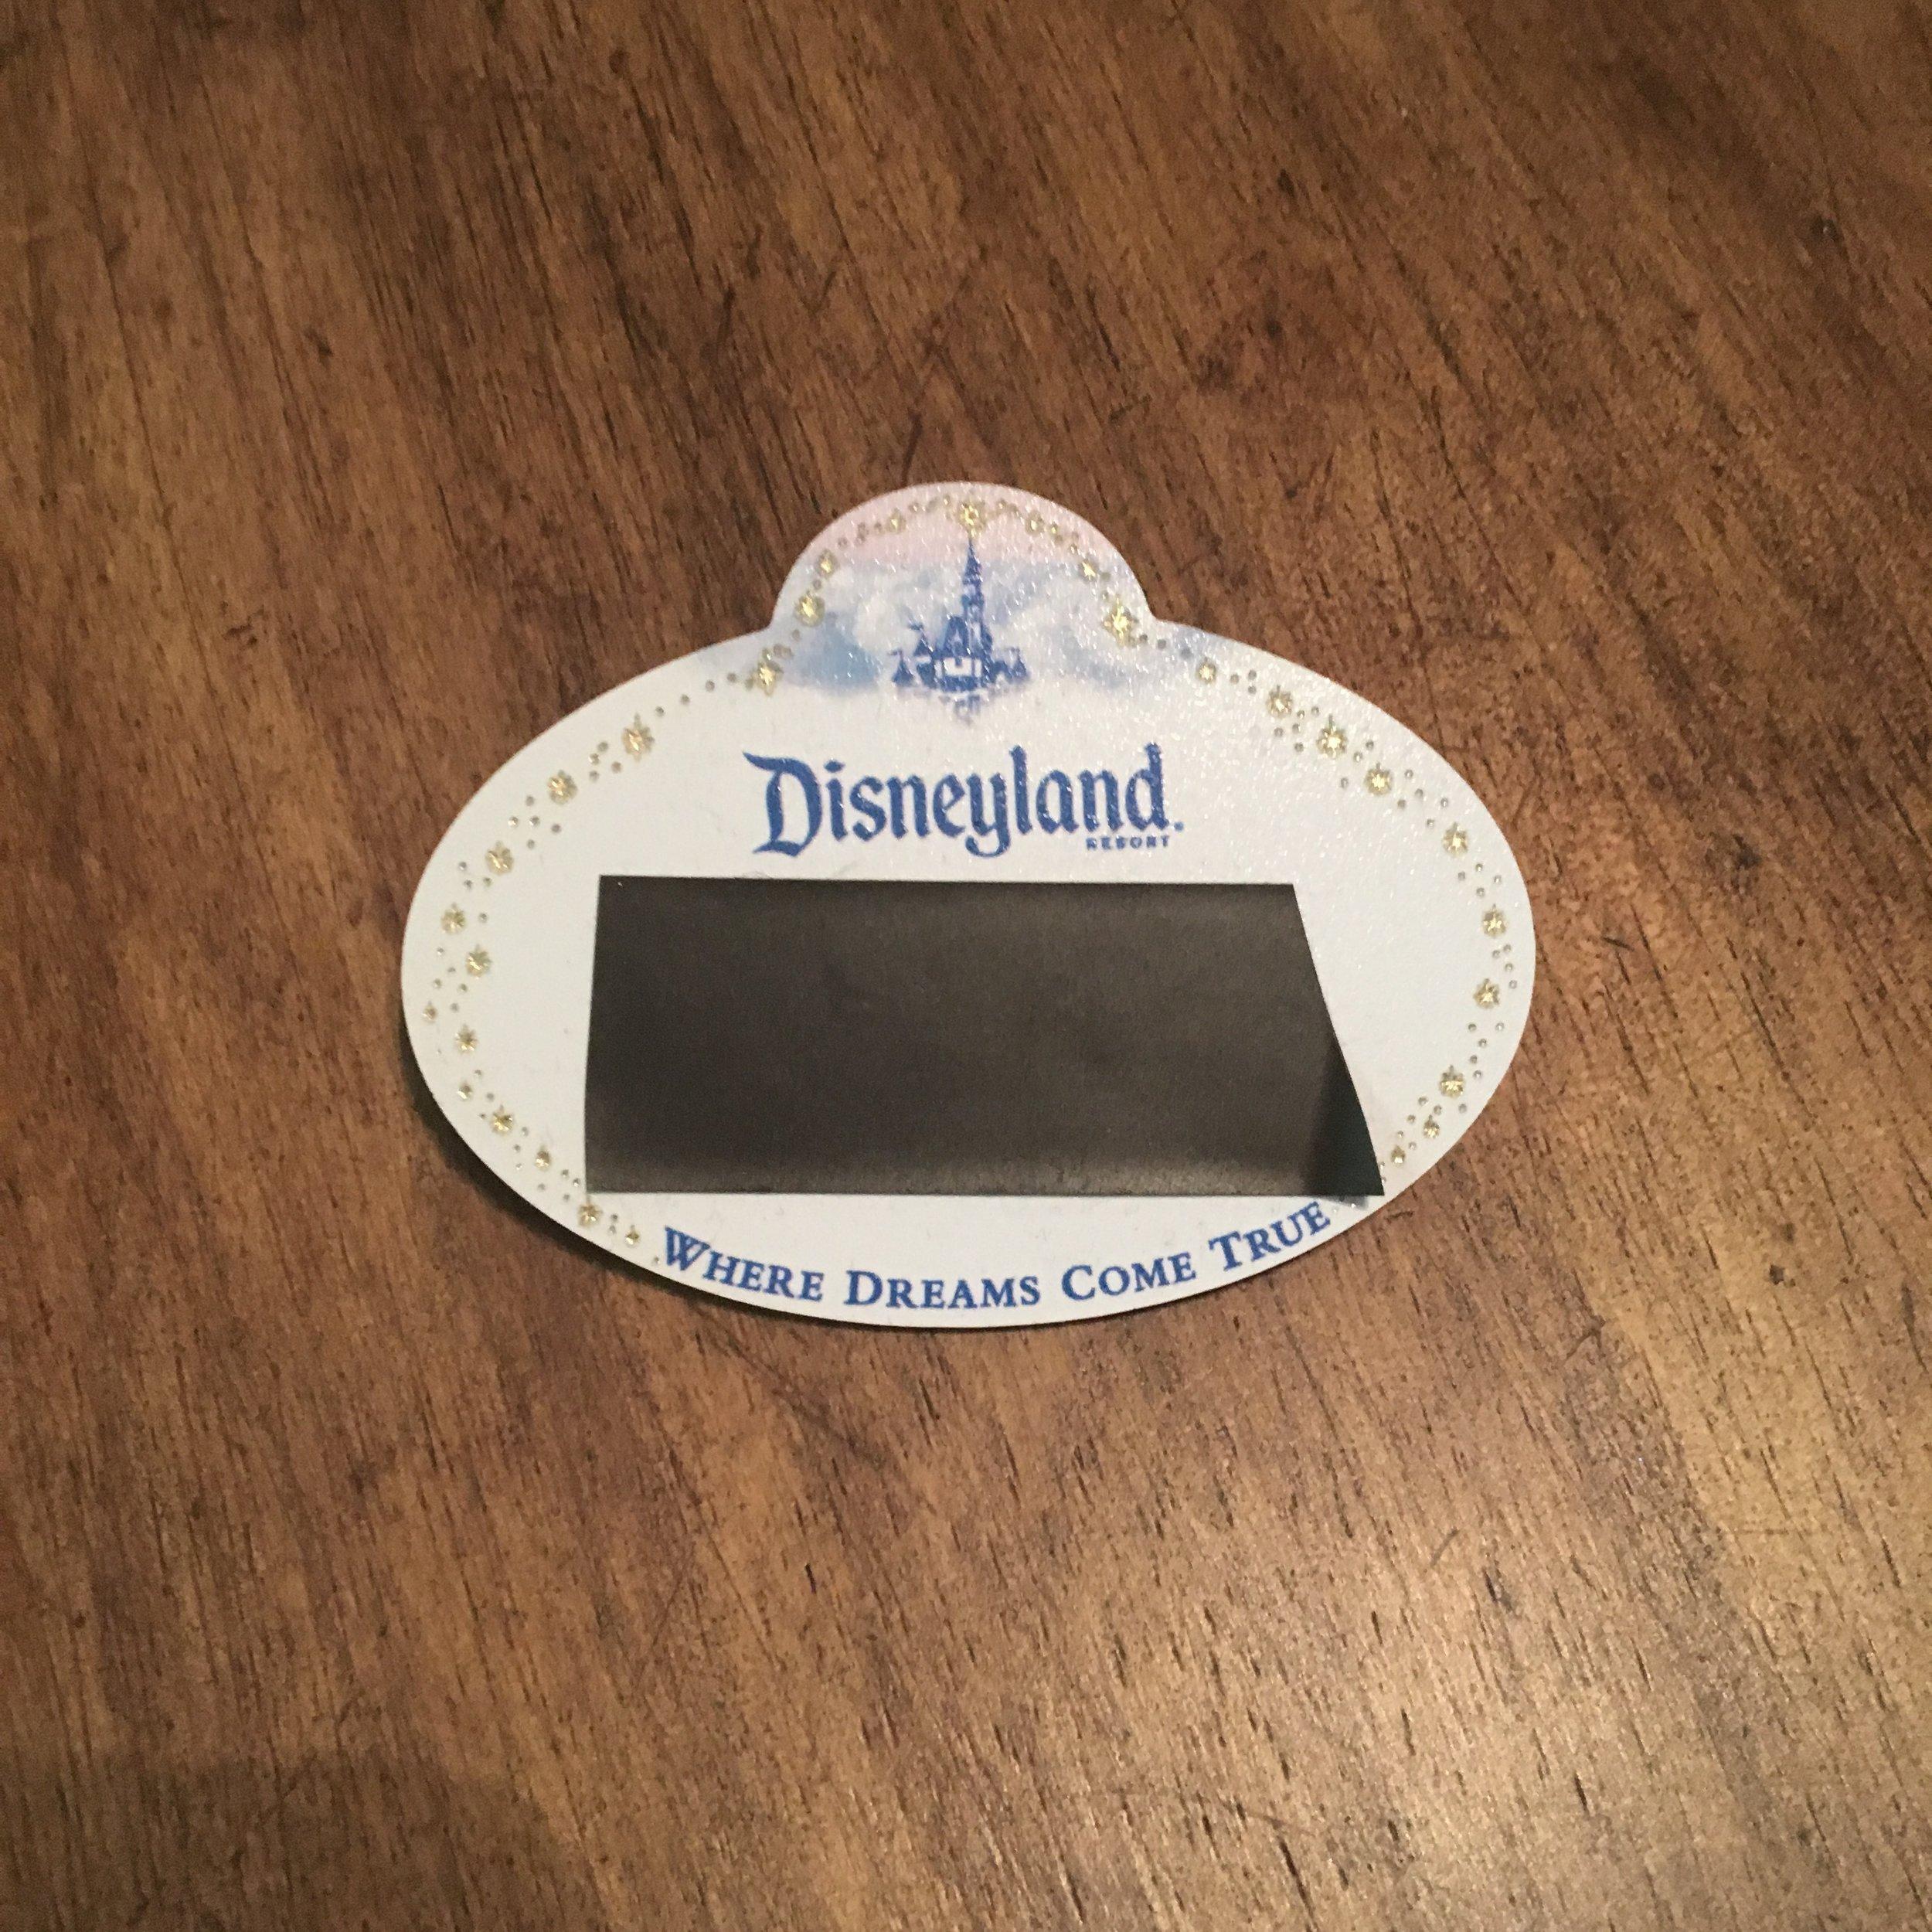 How To Keep Your Kids Safe At Disneyland. #Disneyland #DisneyCaliforniaAdventure #DisneyWithKids #DisneylandTips #FamilyTravel